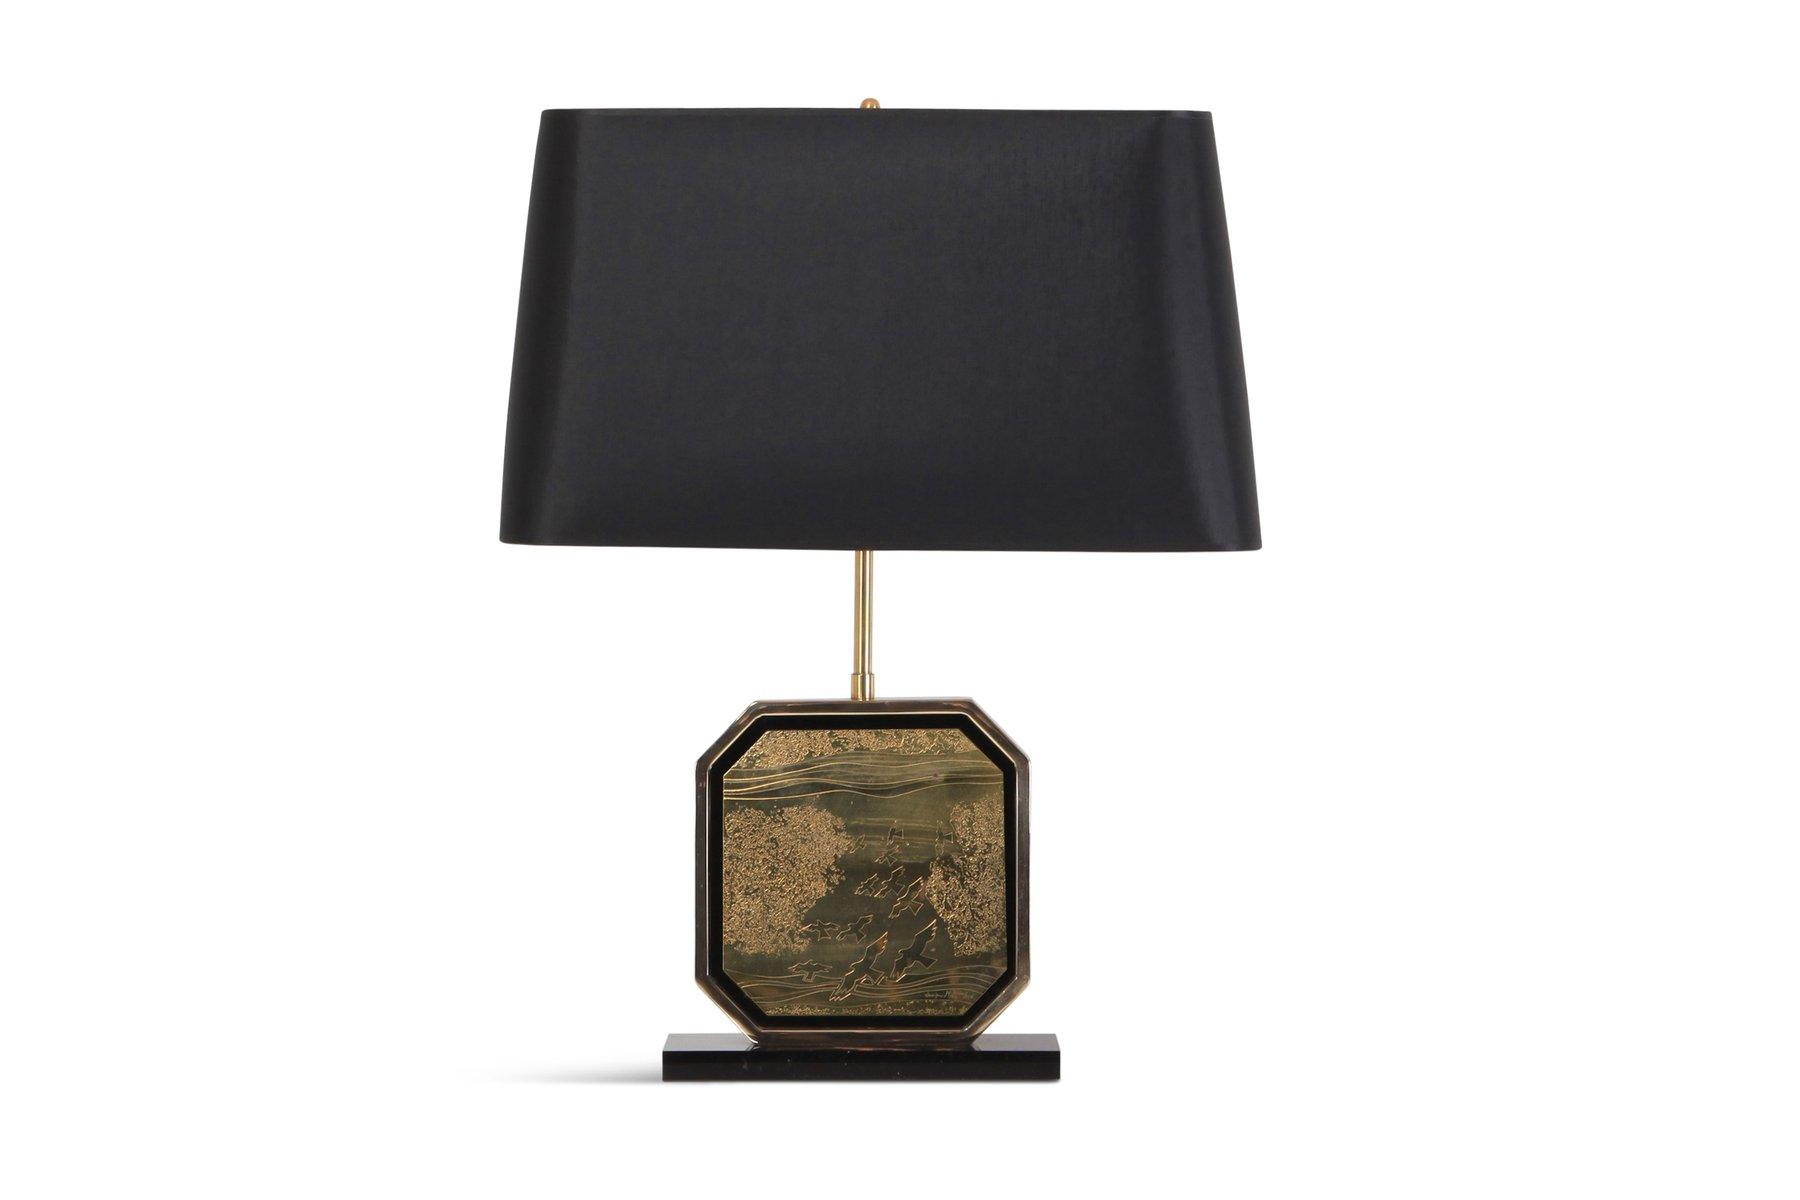 Tischlampe aus vergoldetem Messing im Hollywood Regency-Stil von Maho,...